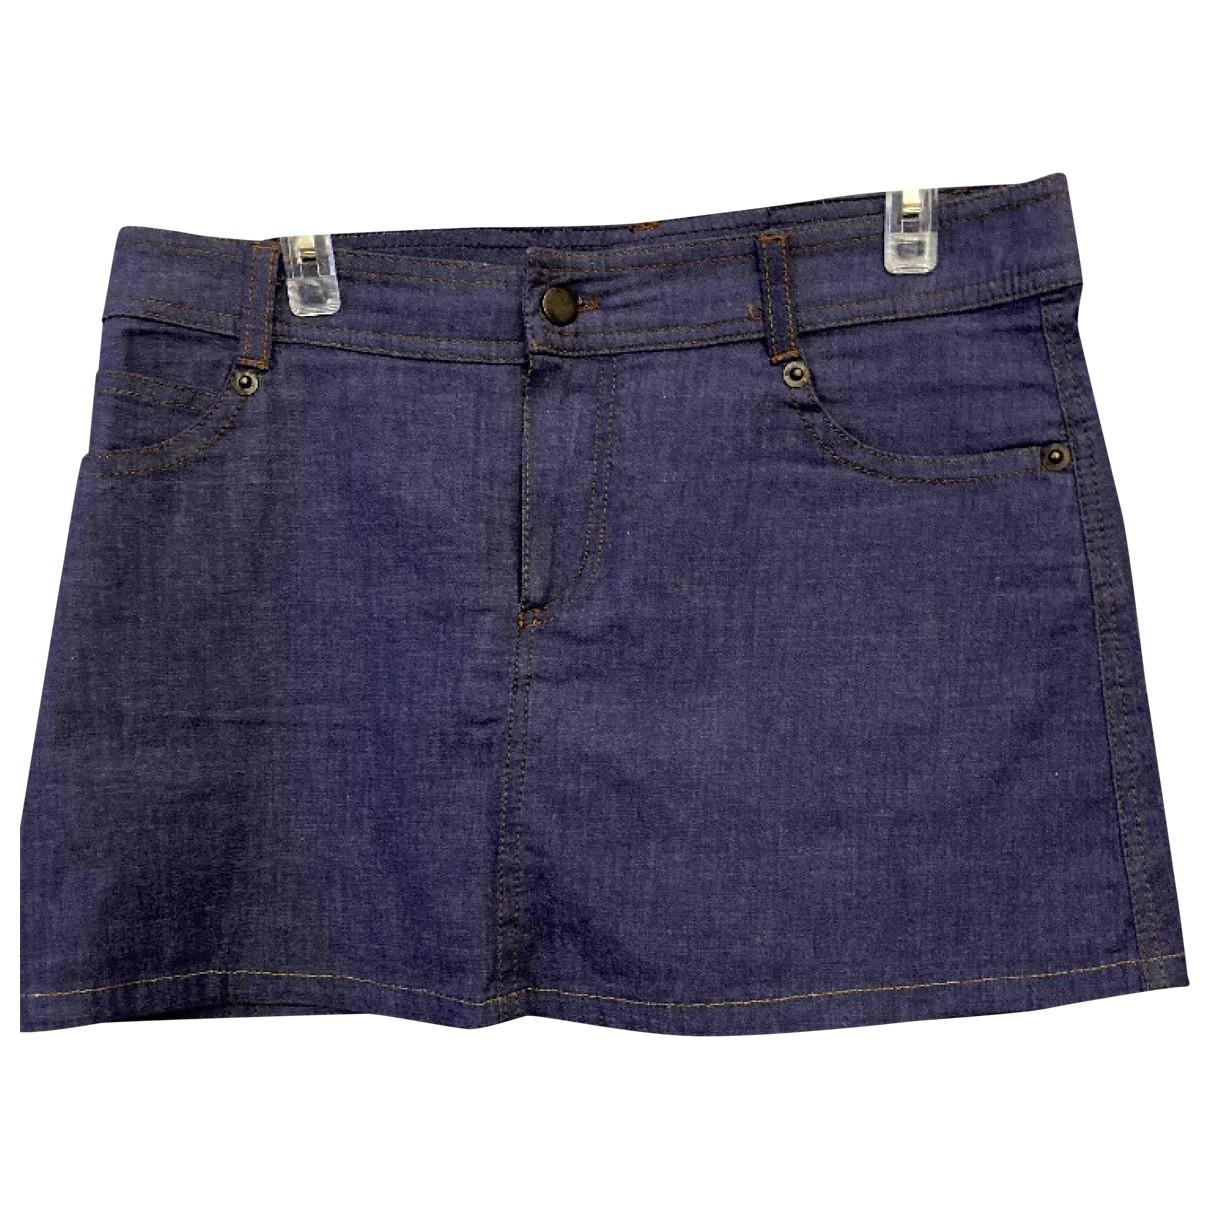 D&g - Jupe   pour femme en denim - violet